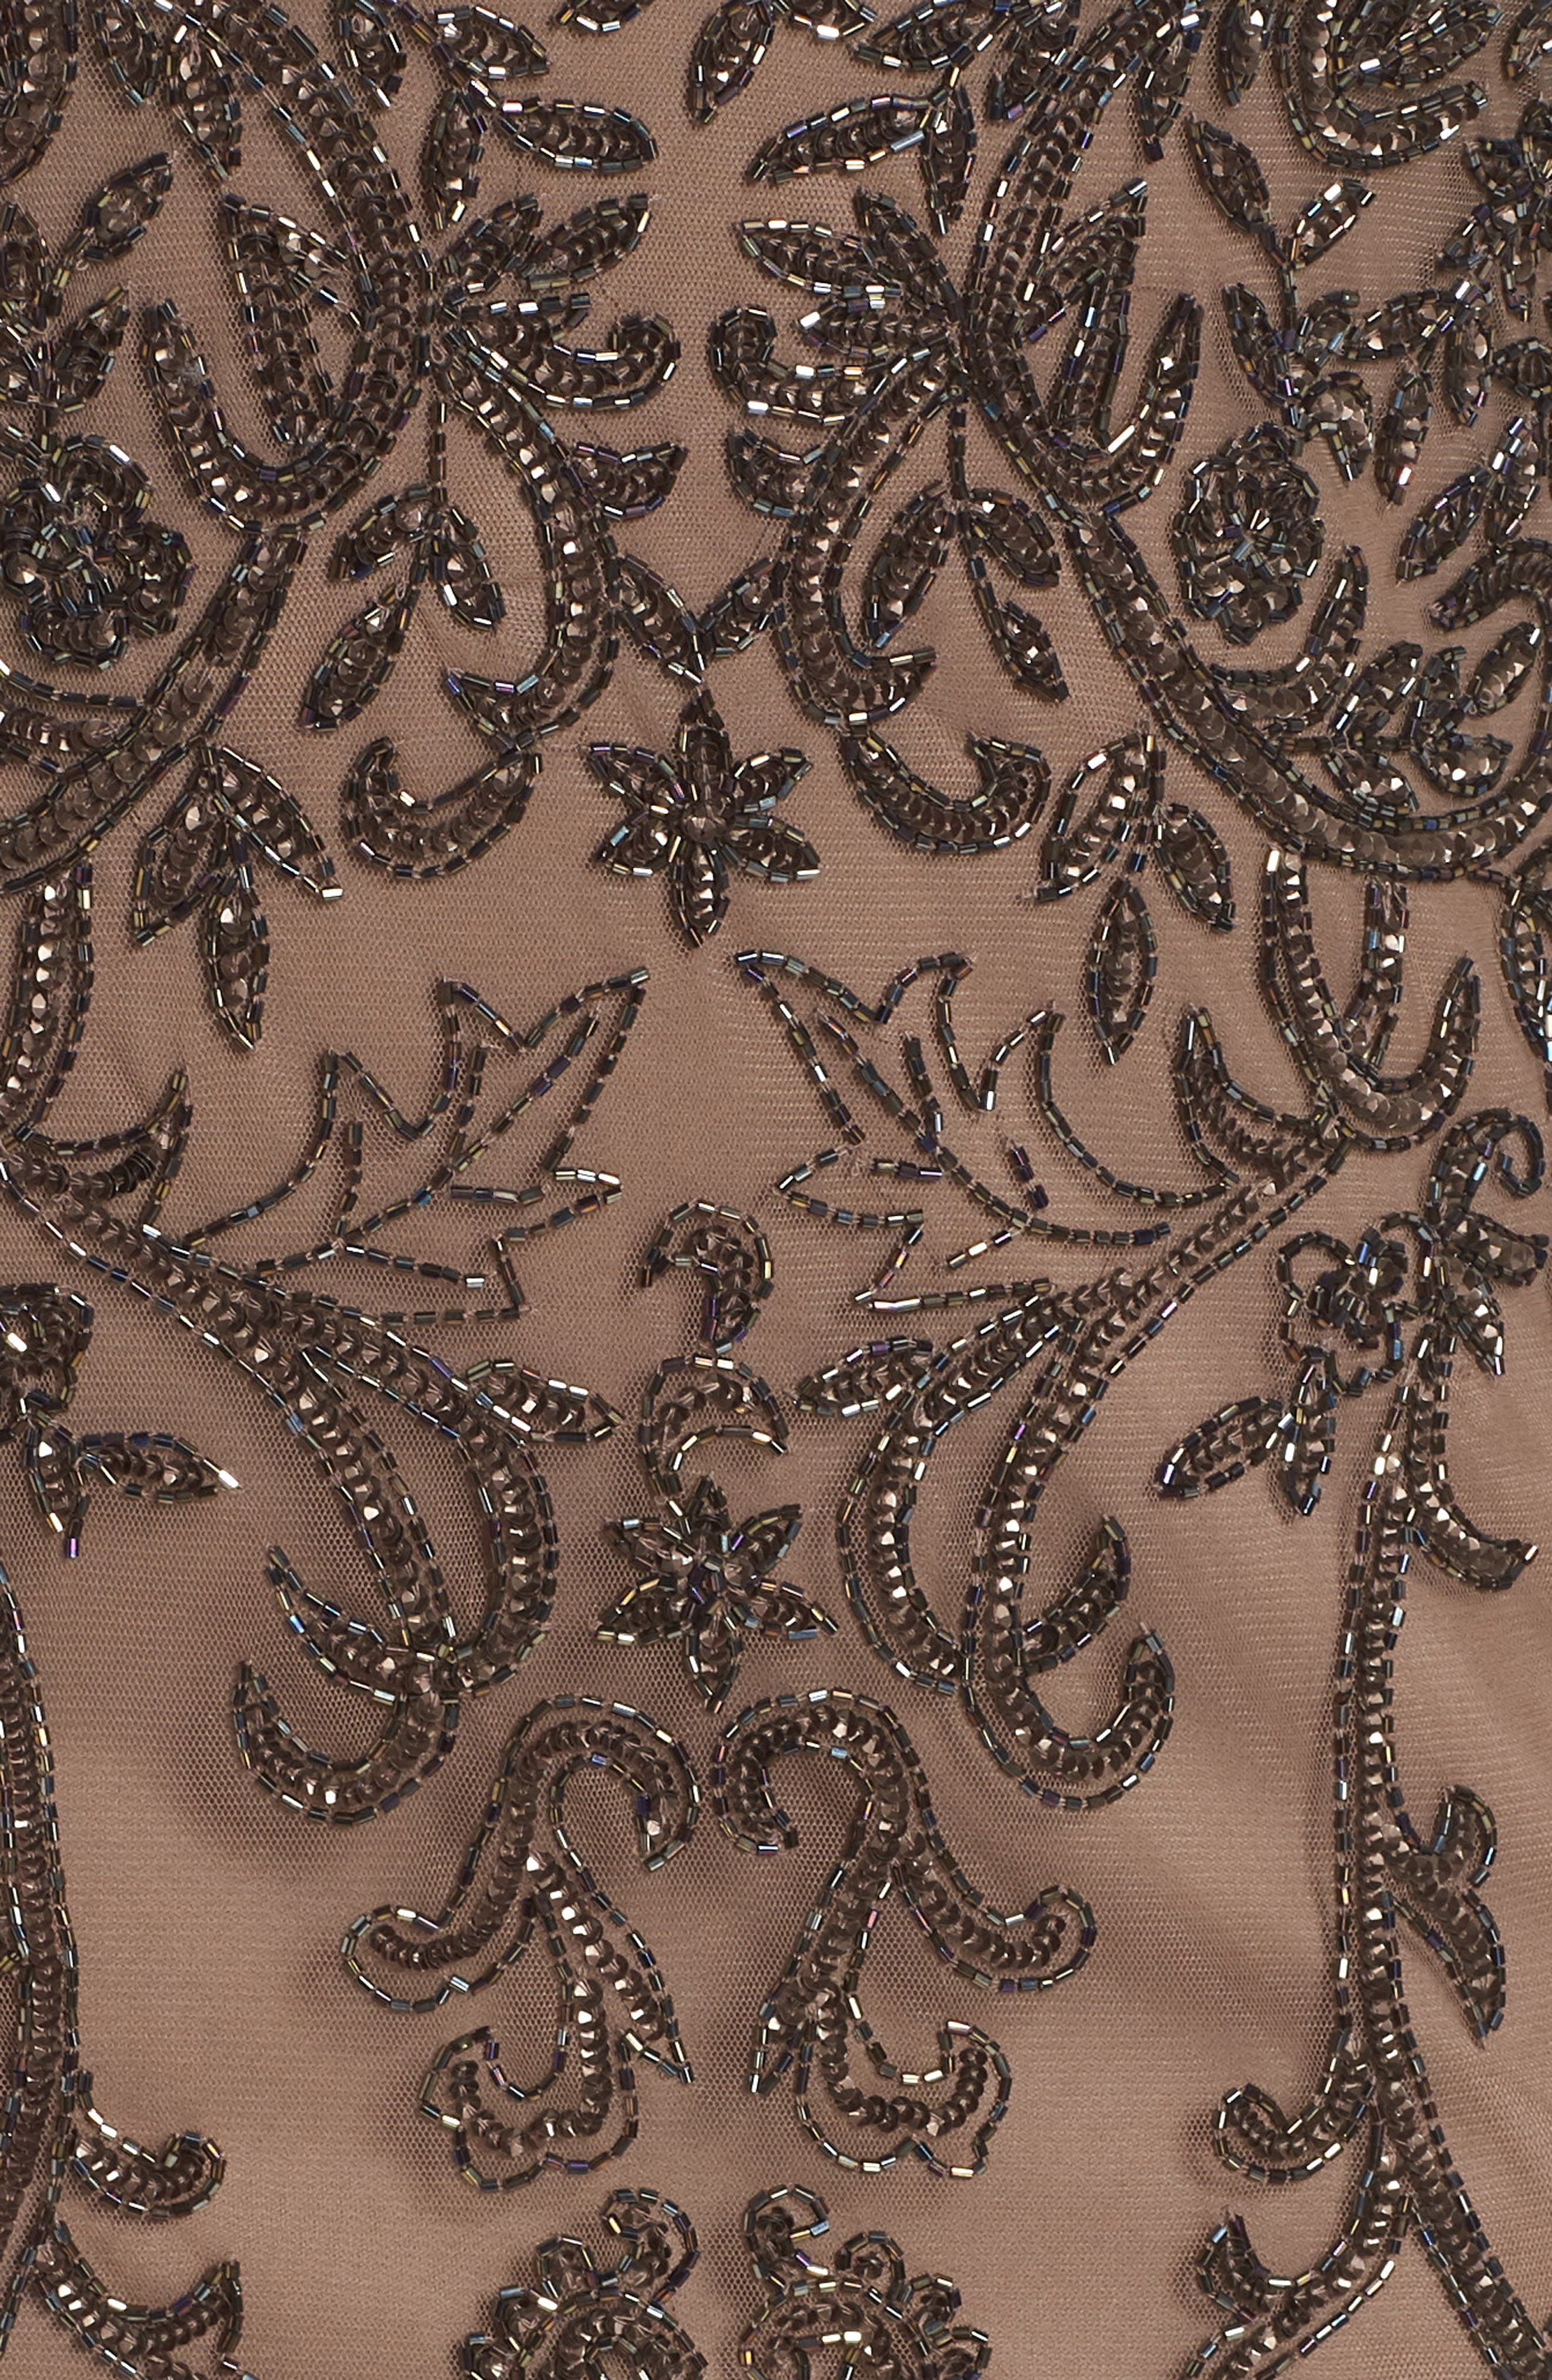 Illusion Sleeve Beaded Sheath Dress,                             Alternate thumbnail 6, color,                             BROWN/ GOLD